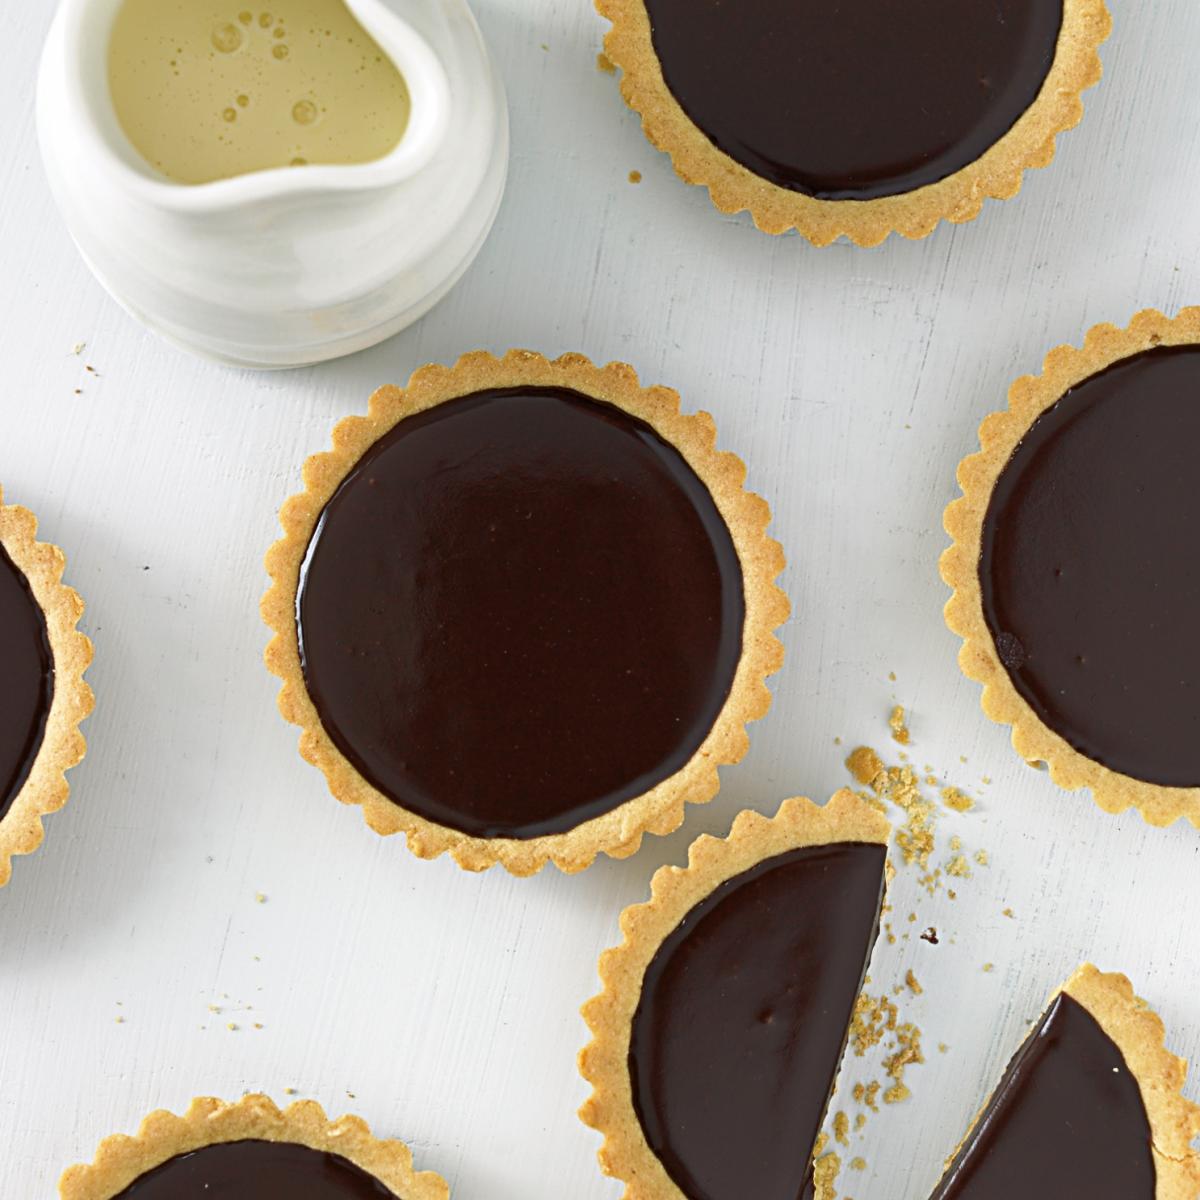 Cheat chocolate tartlets